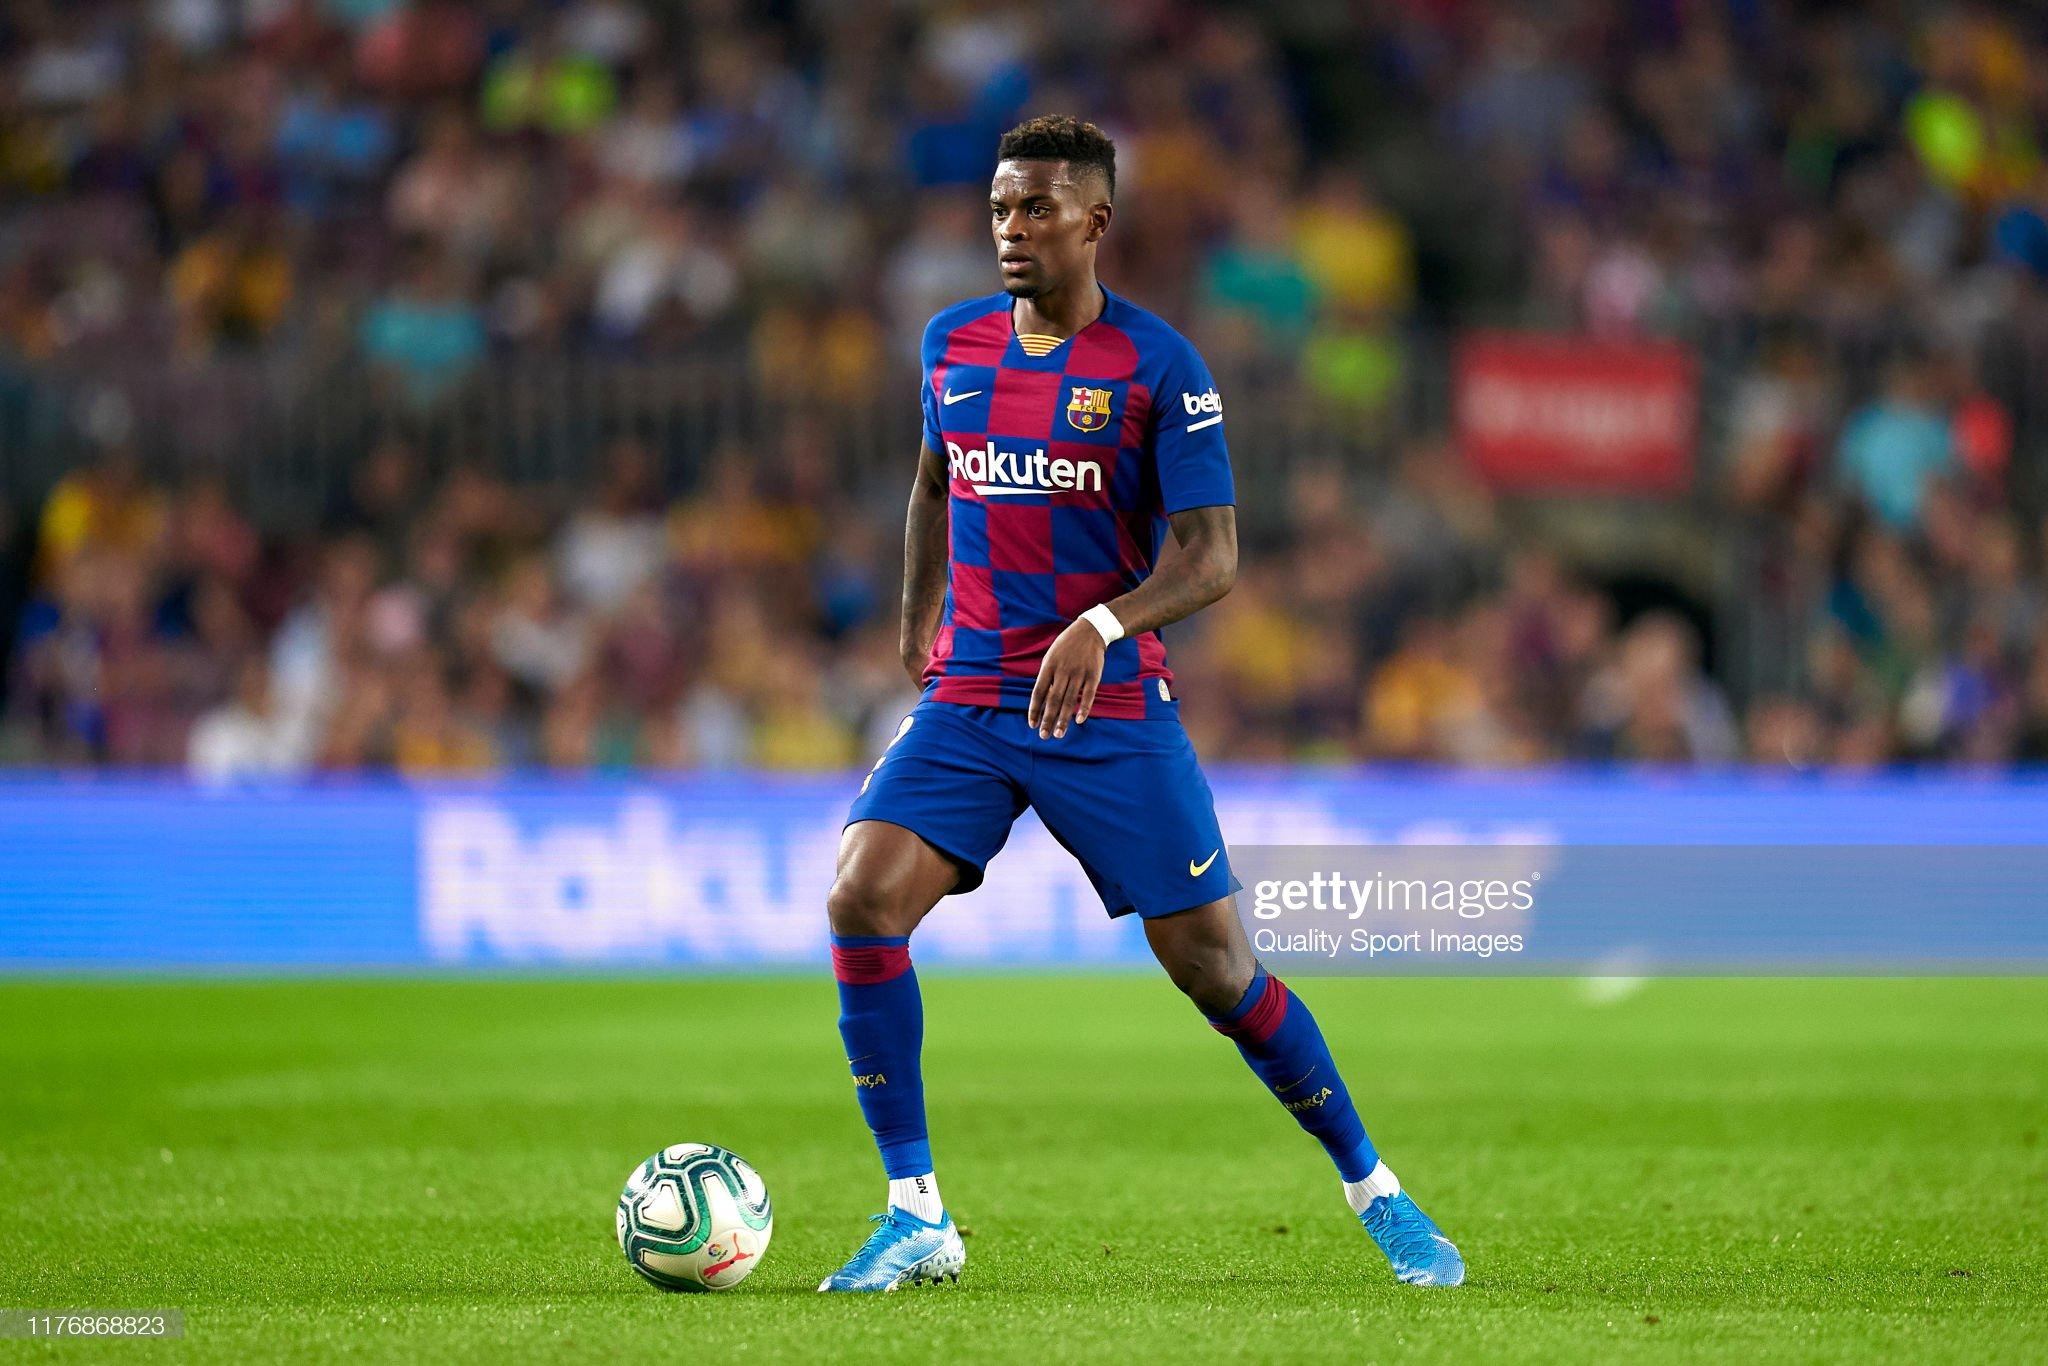 صور مباراة : برشلونة - فياريال 2-1 ( 24-09-2019 )  Nelson-semedo-of-fc-barcelona-with-the-ball-during-the-liga-match-fc-picture-id1176868823?s=2048x2048